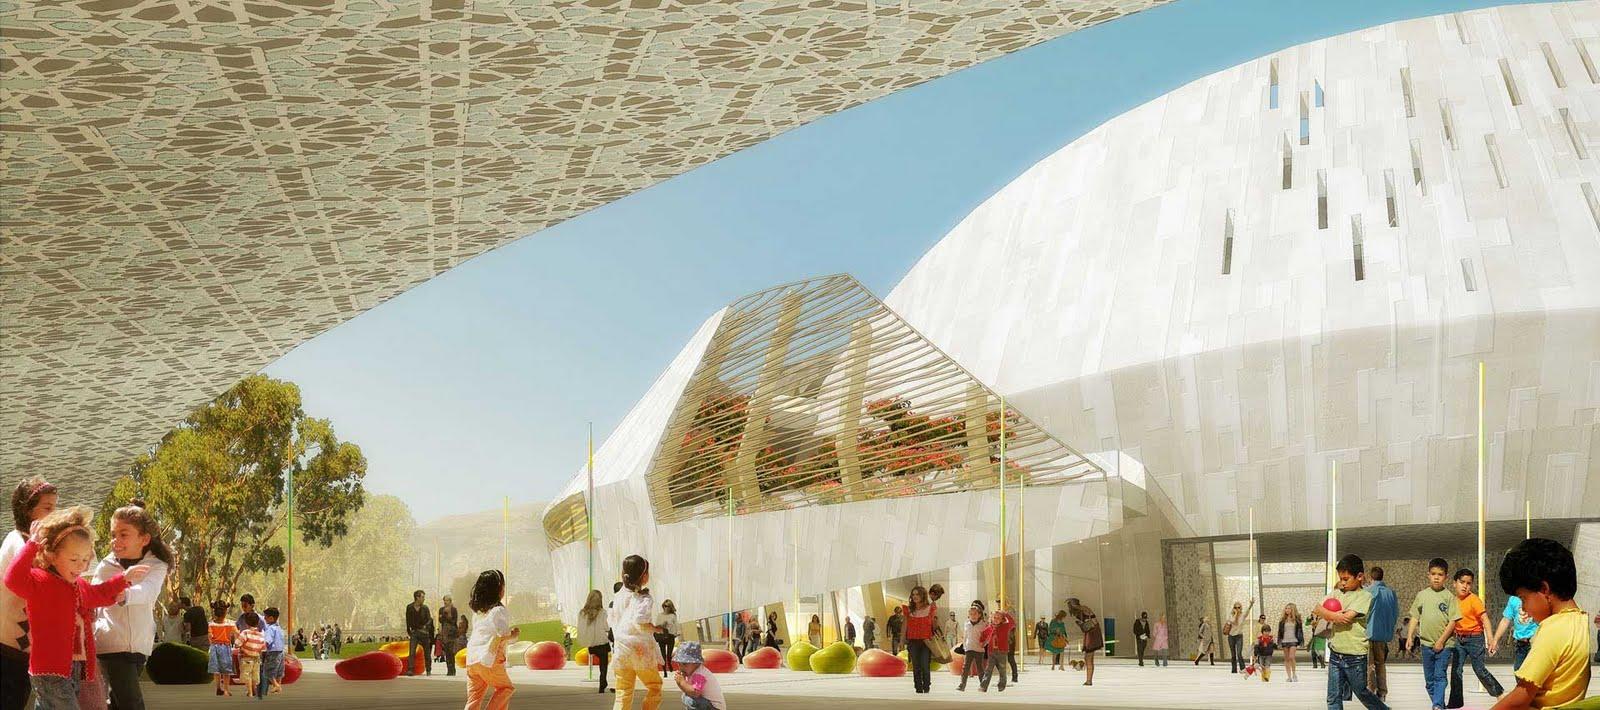 Children S Discover Centre By Henning Larsen Architects